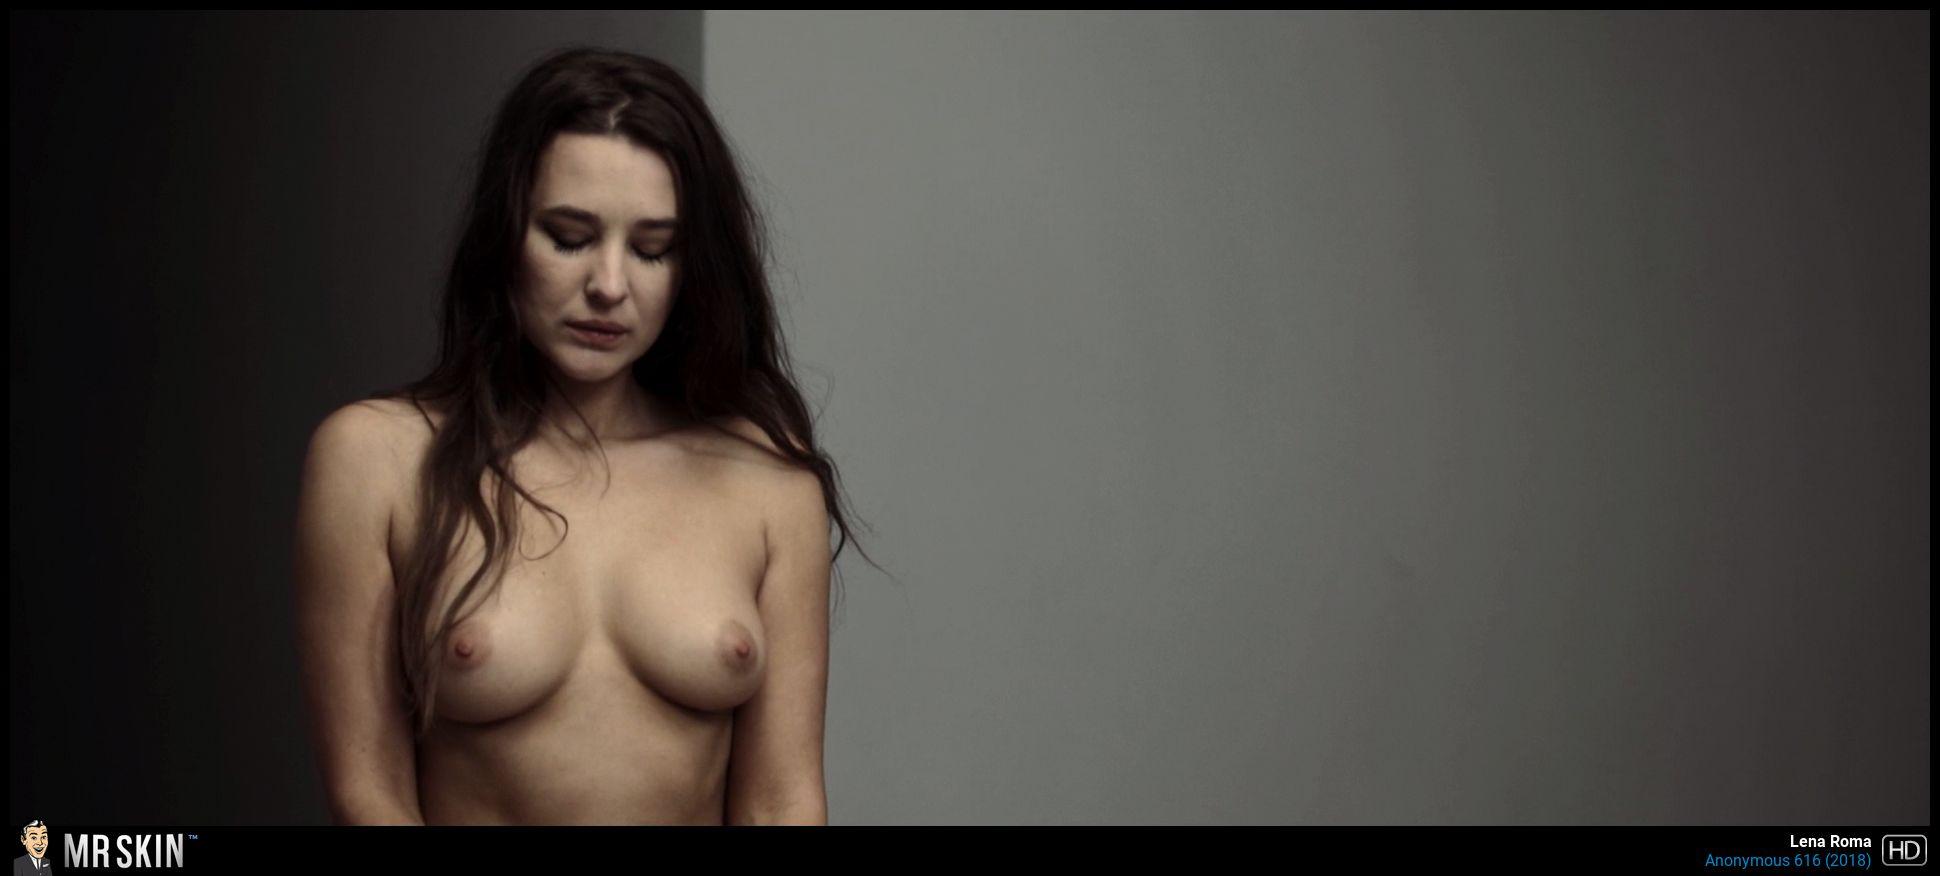 Lena Roma in Anonymous 616